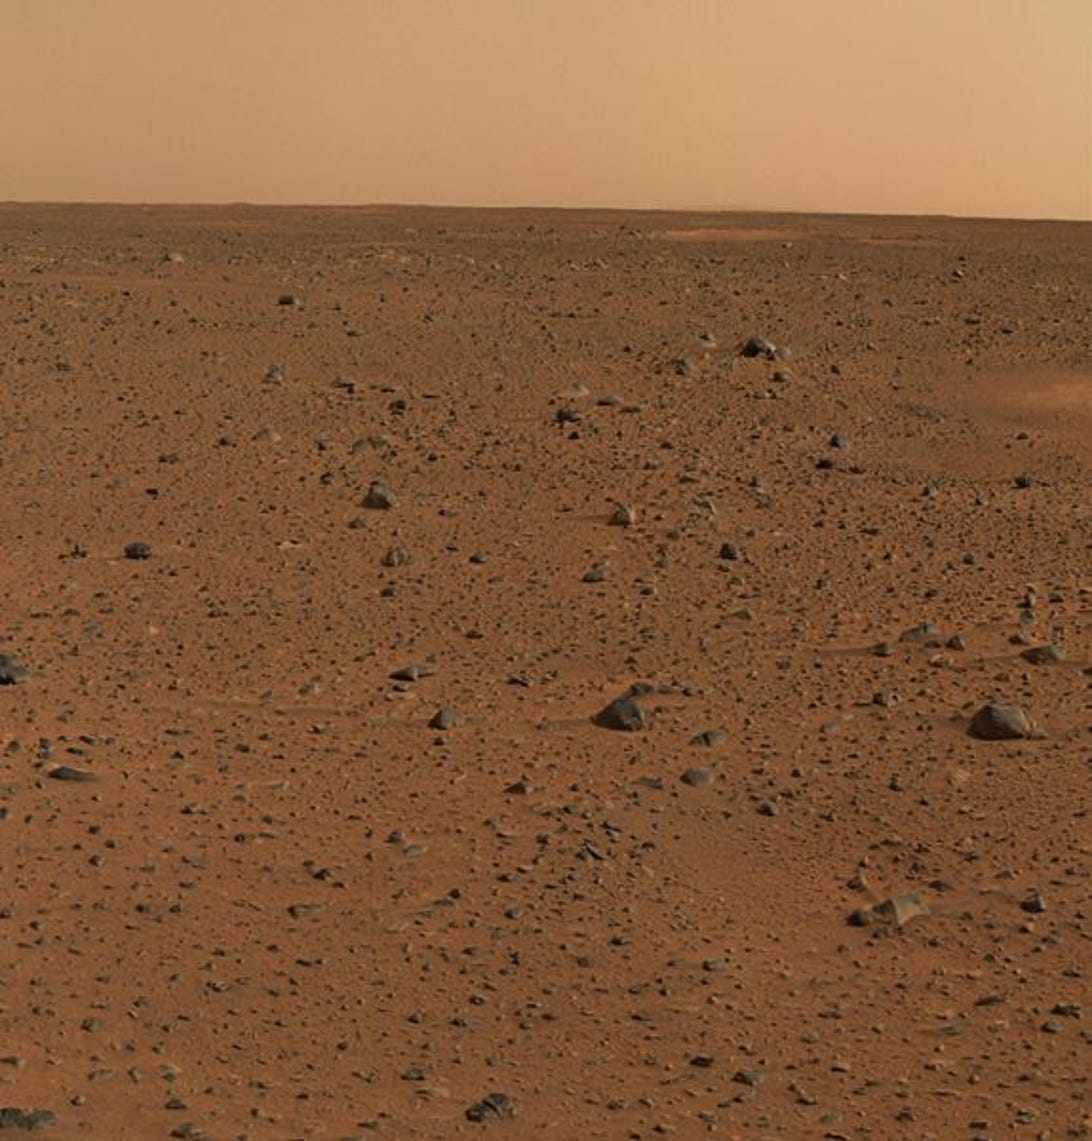 574px-Spirits_First_Color_Photograph_Mars.jpg